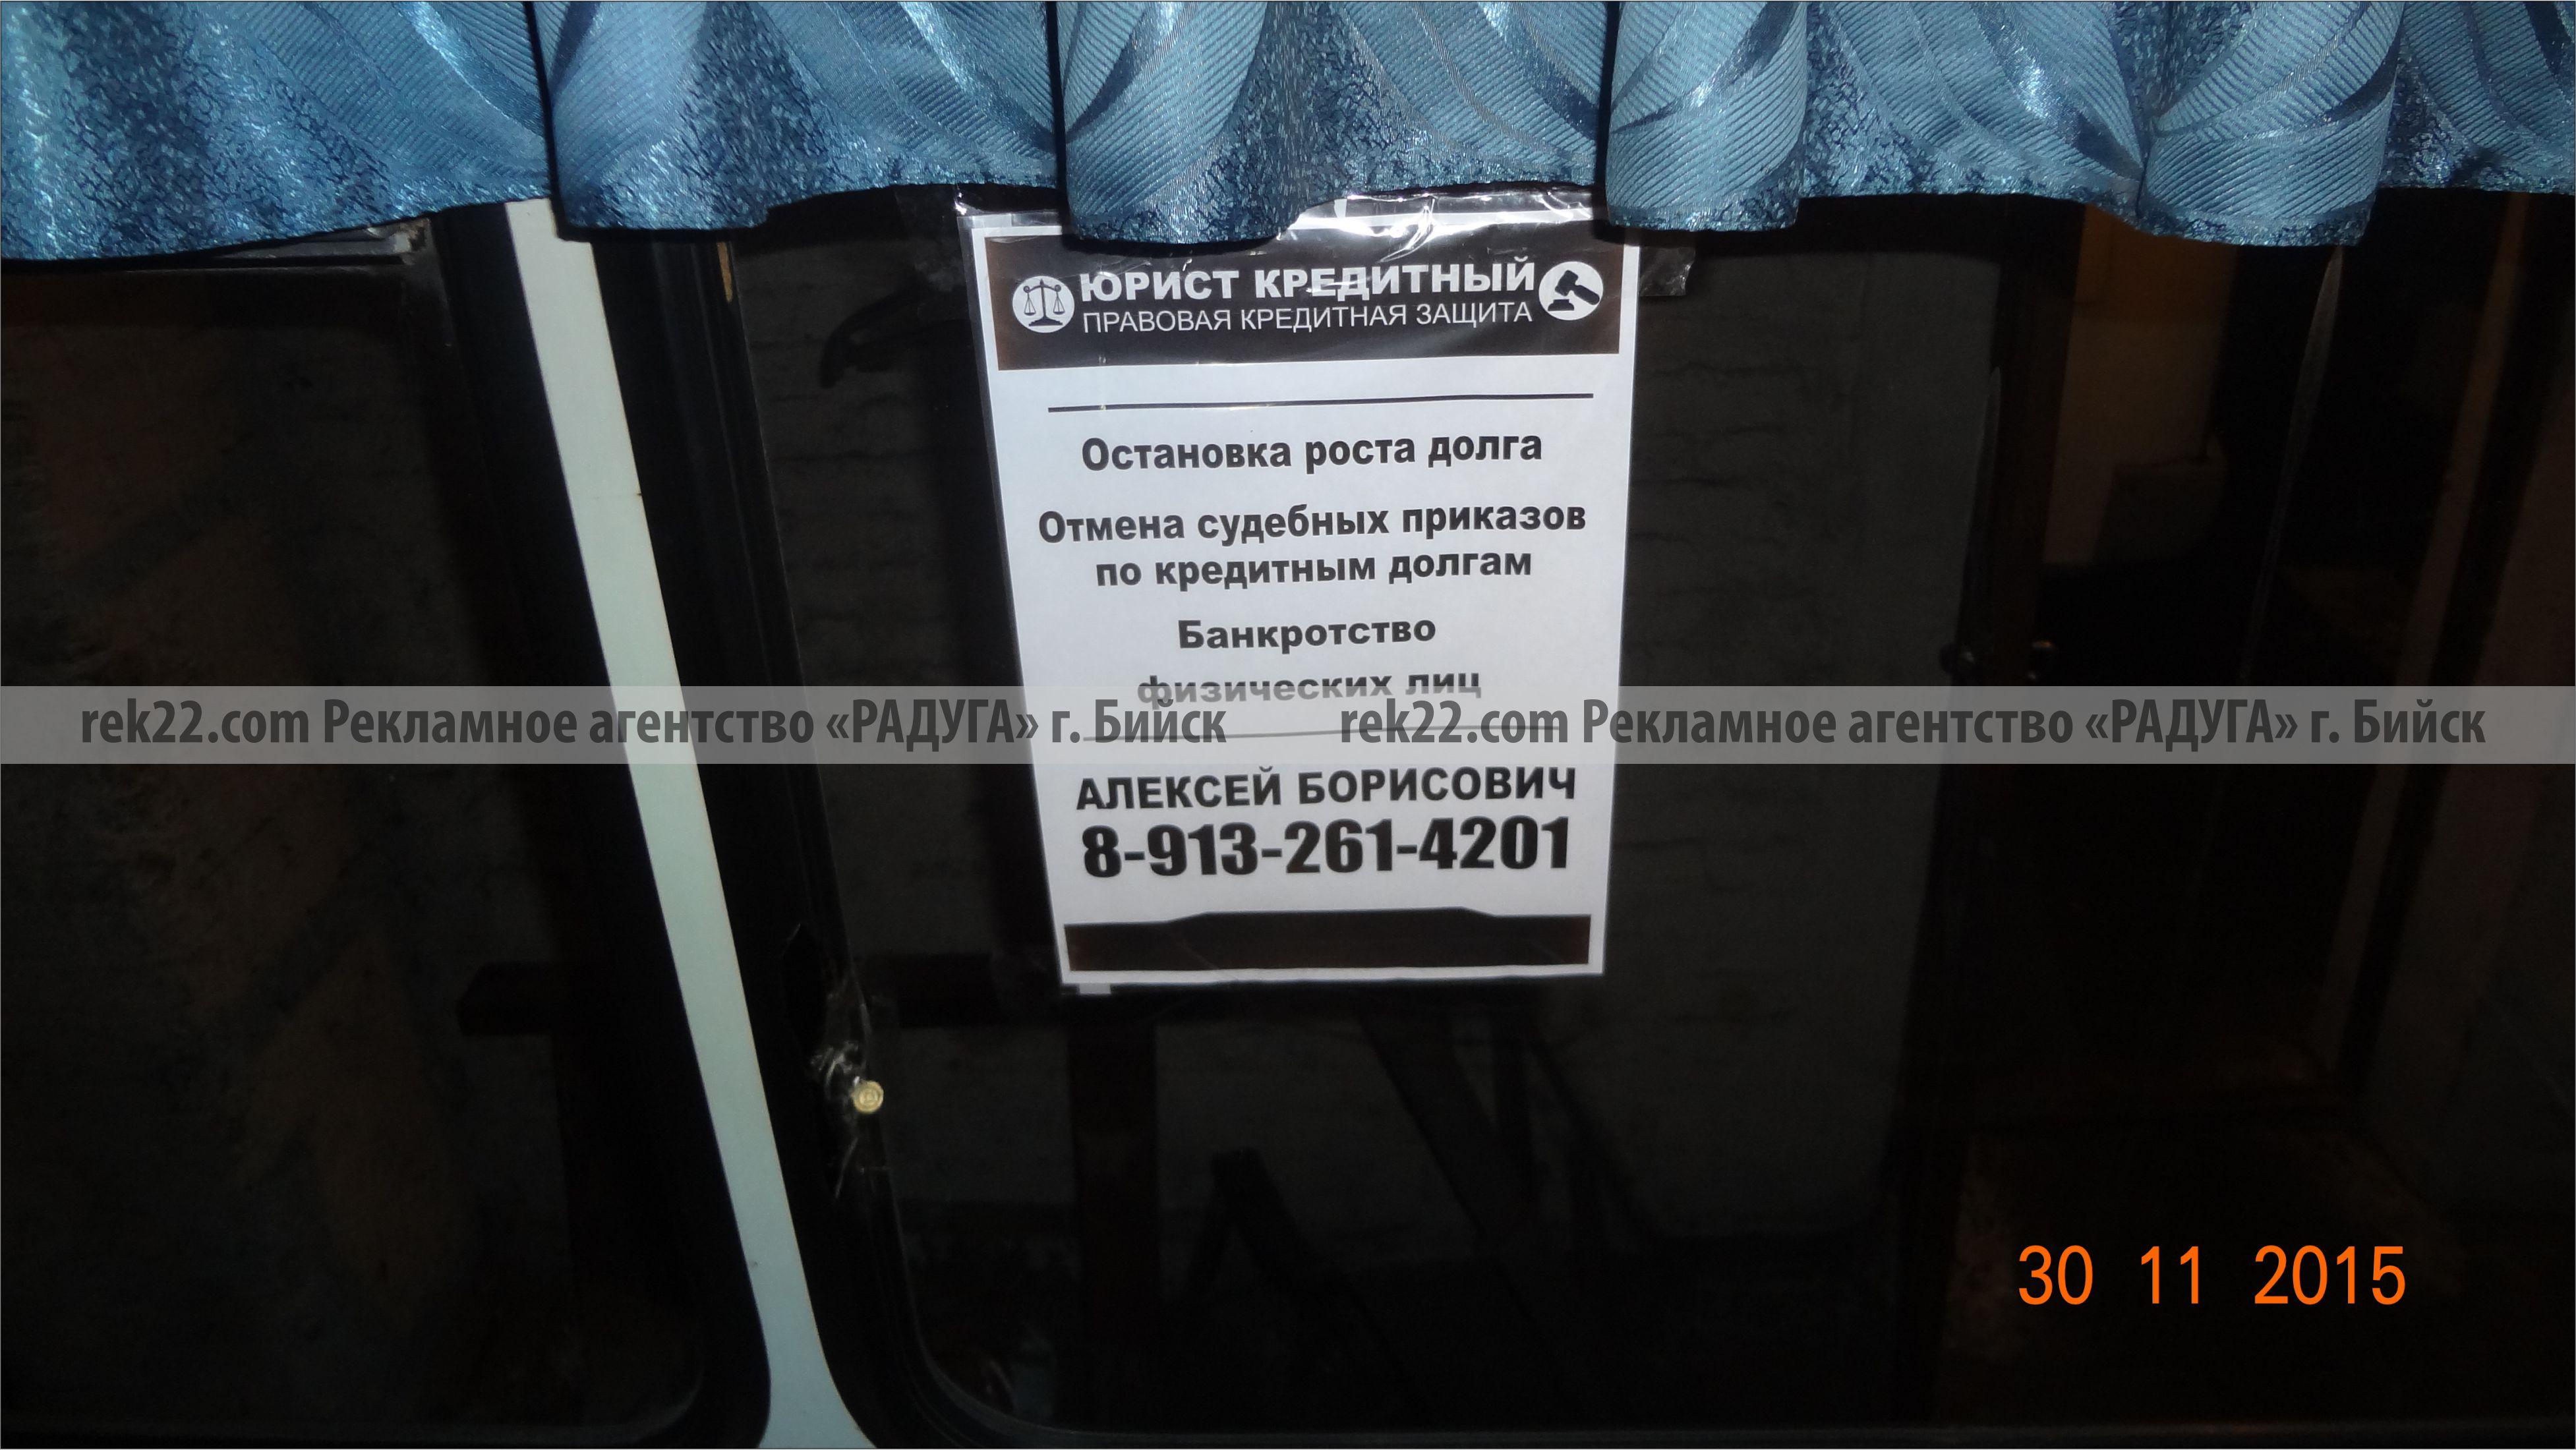 Реклама на транспорте Бийск - листовки - 13